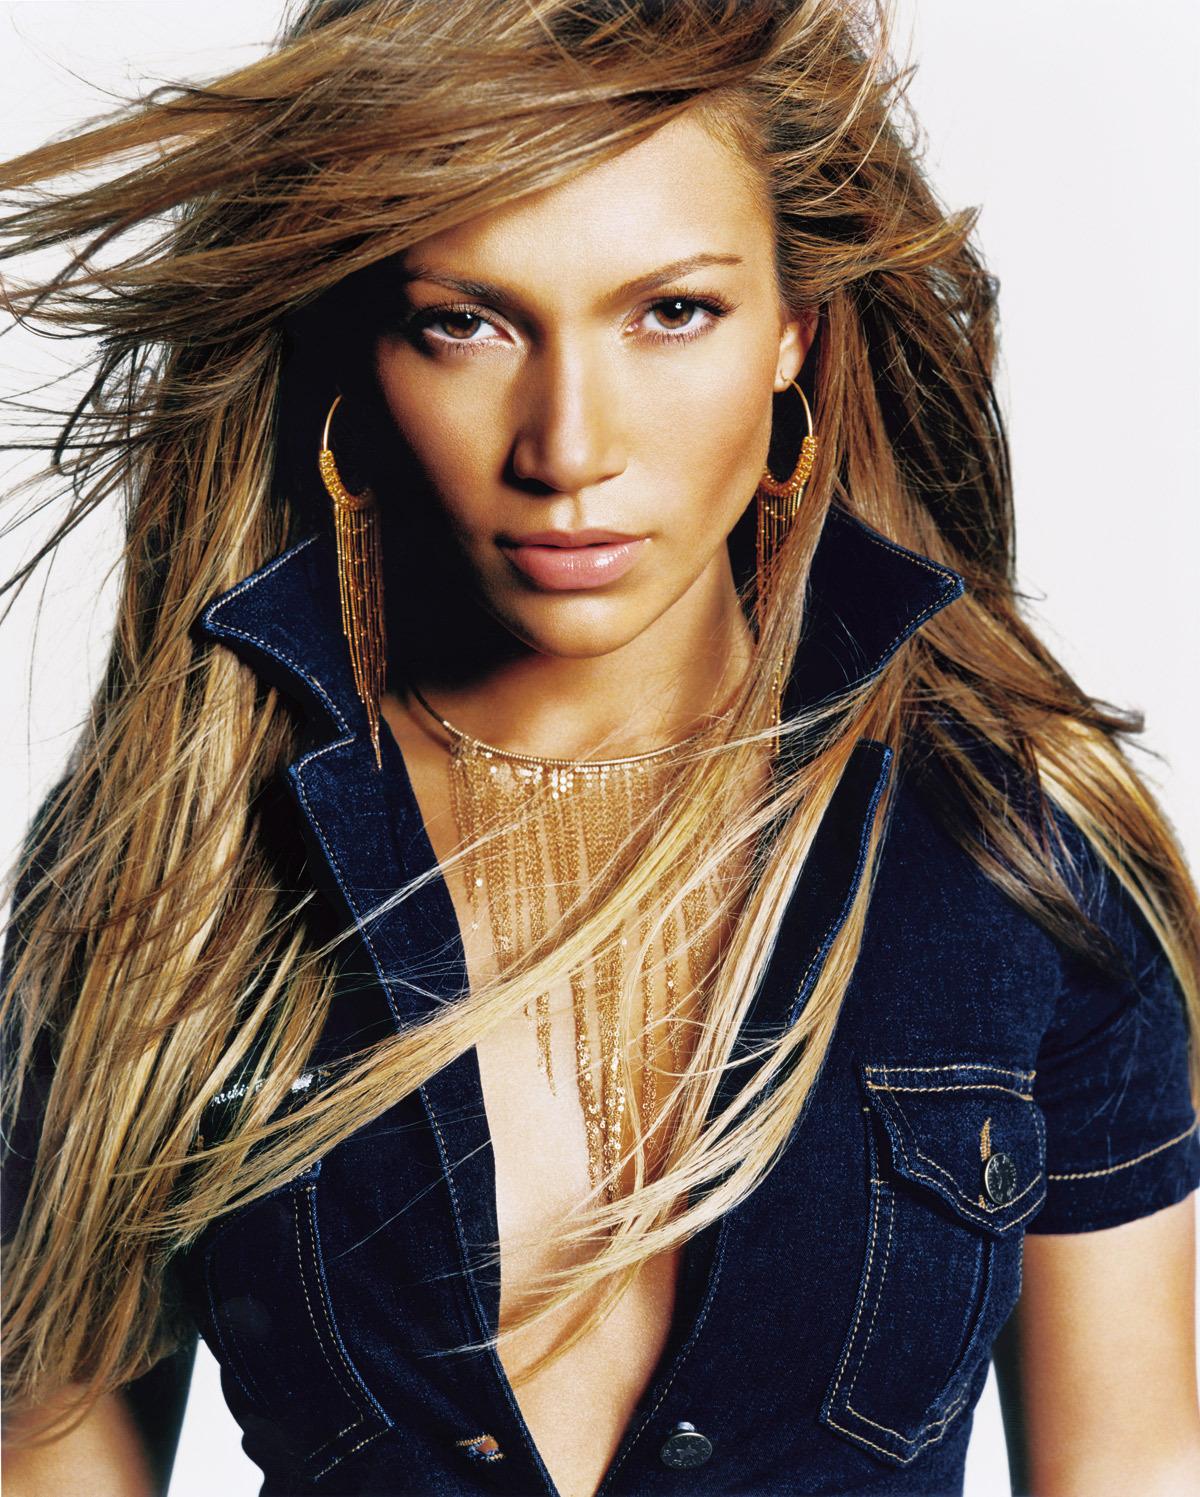 Jennifer Lopez images j.lo photoshoot HD wallpaper and ... Jennifer Lopez